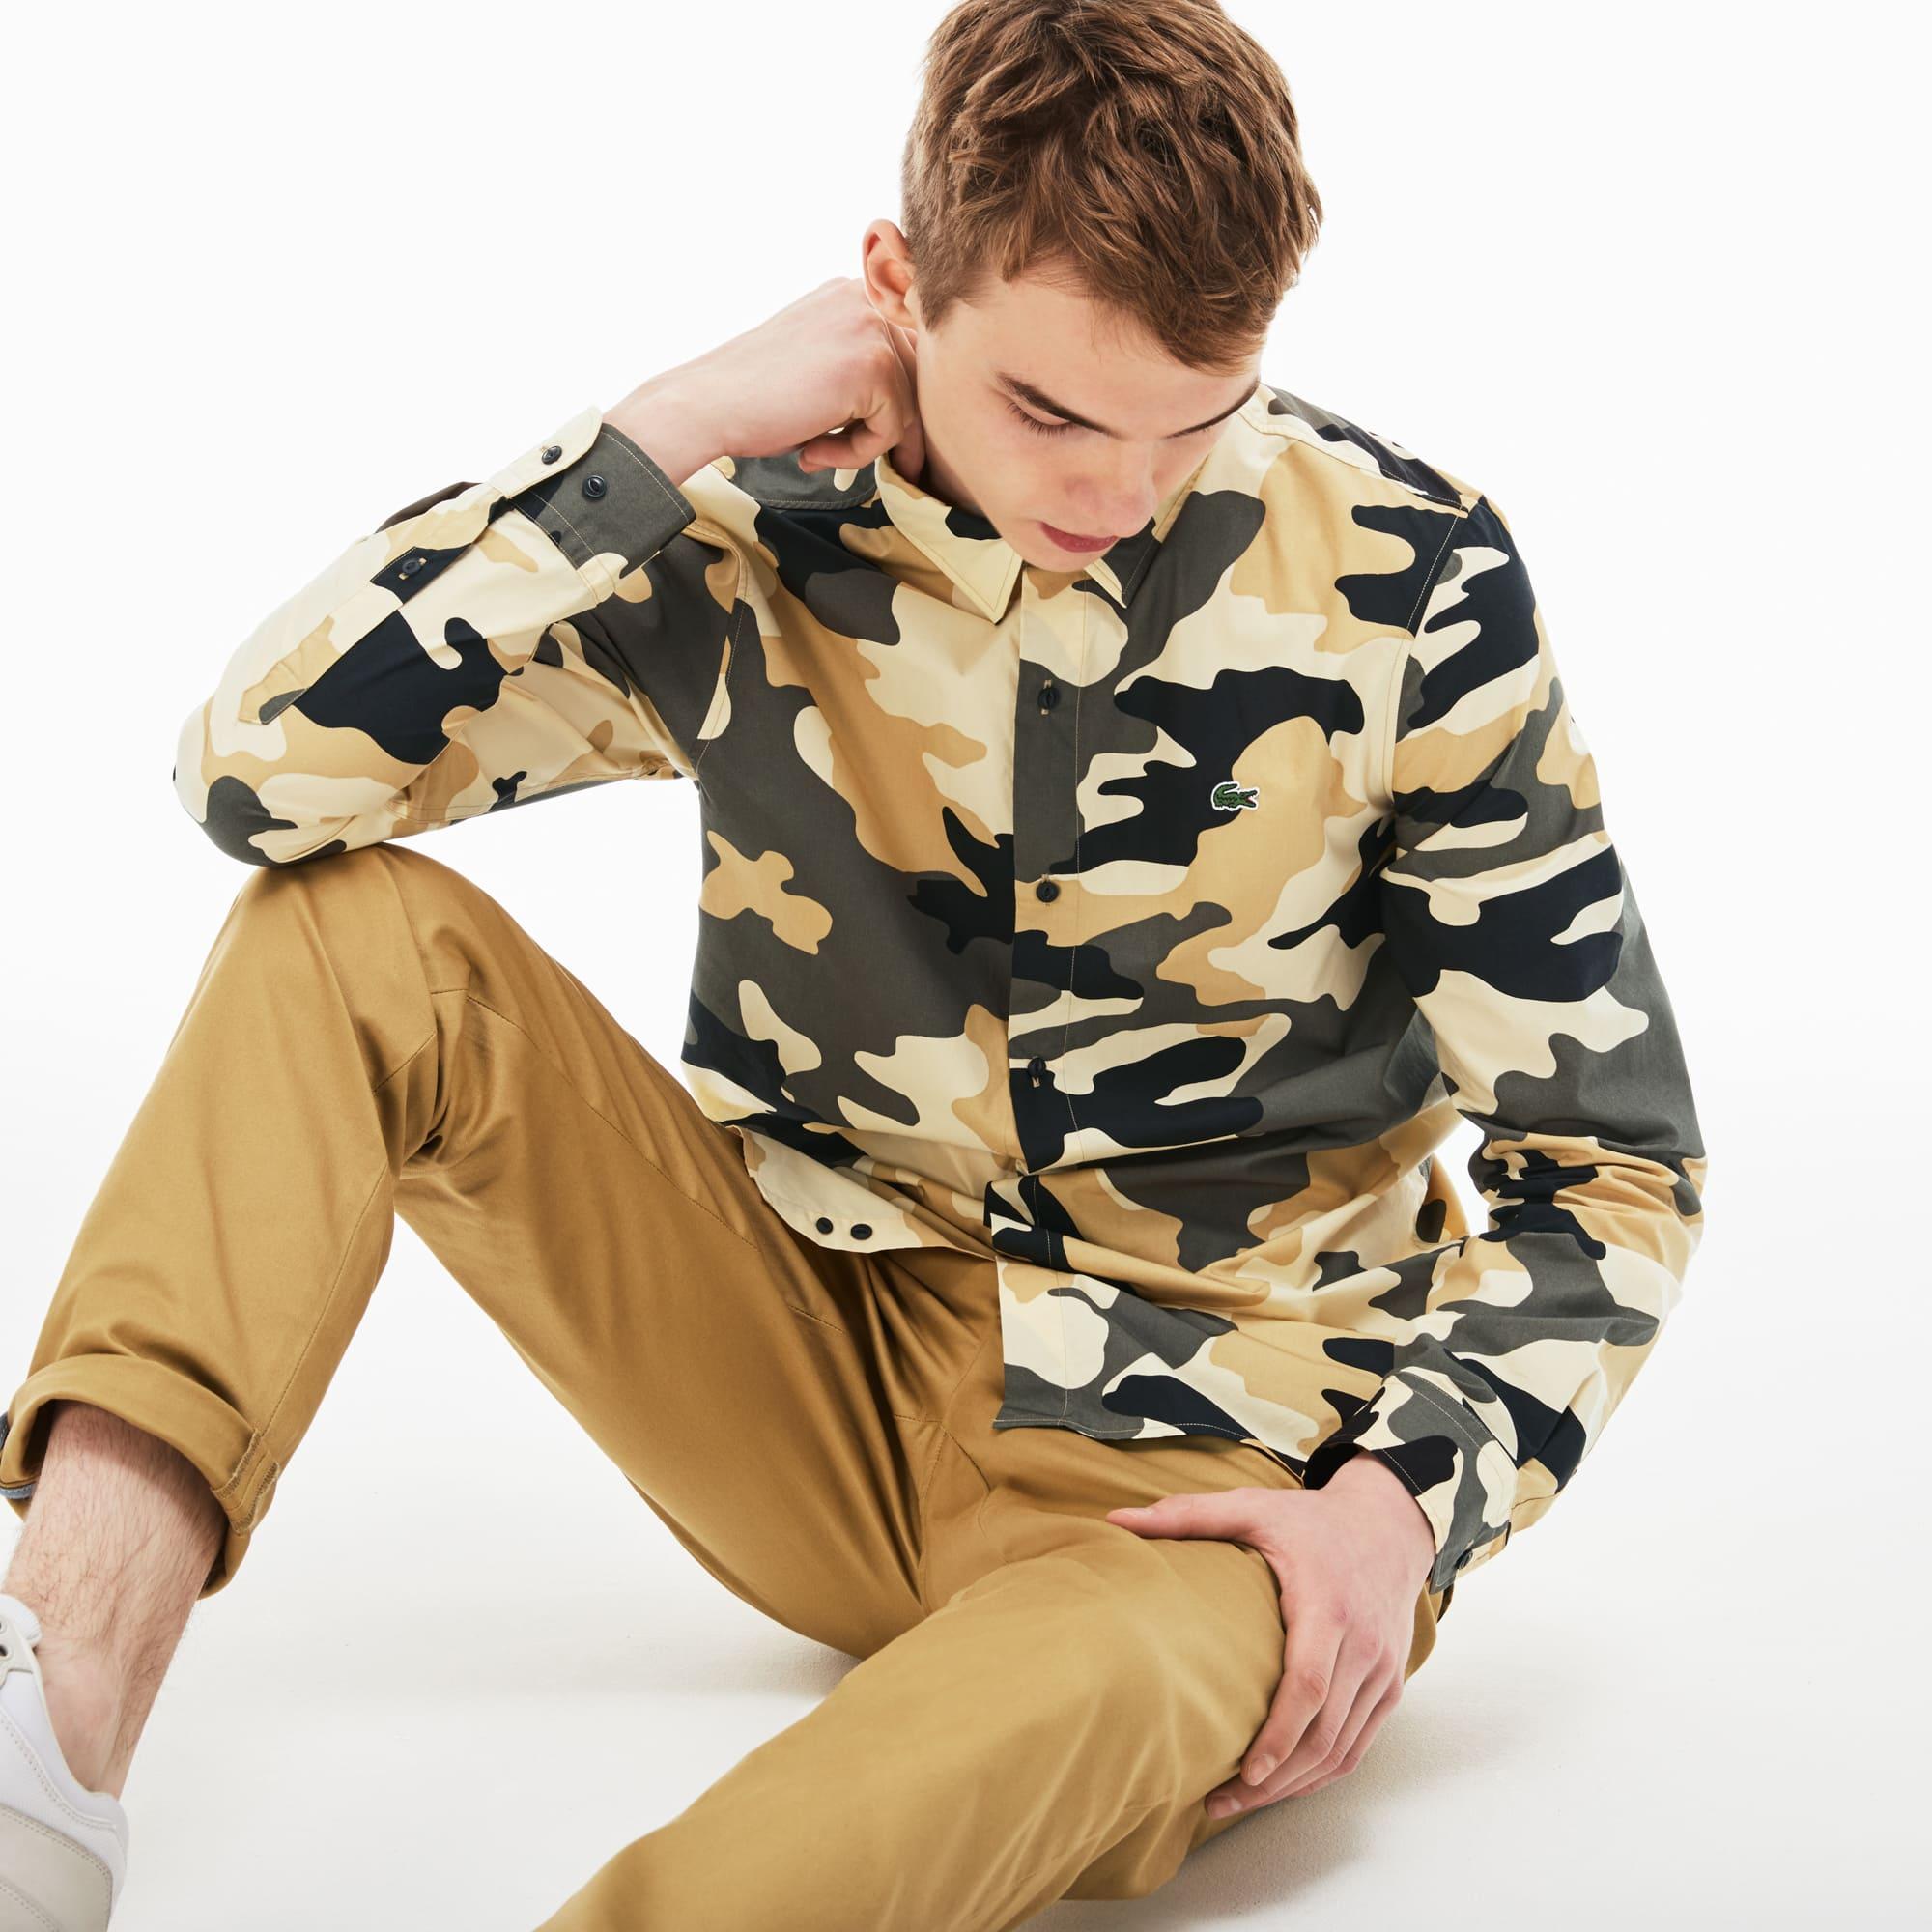 Slim Fit Herren-Hemd aus Popeline mit Tarnmuster LACOSTE L!VE